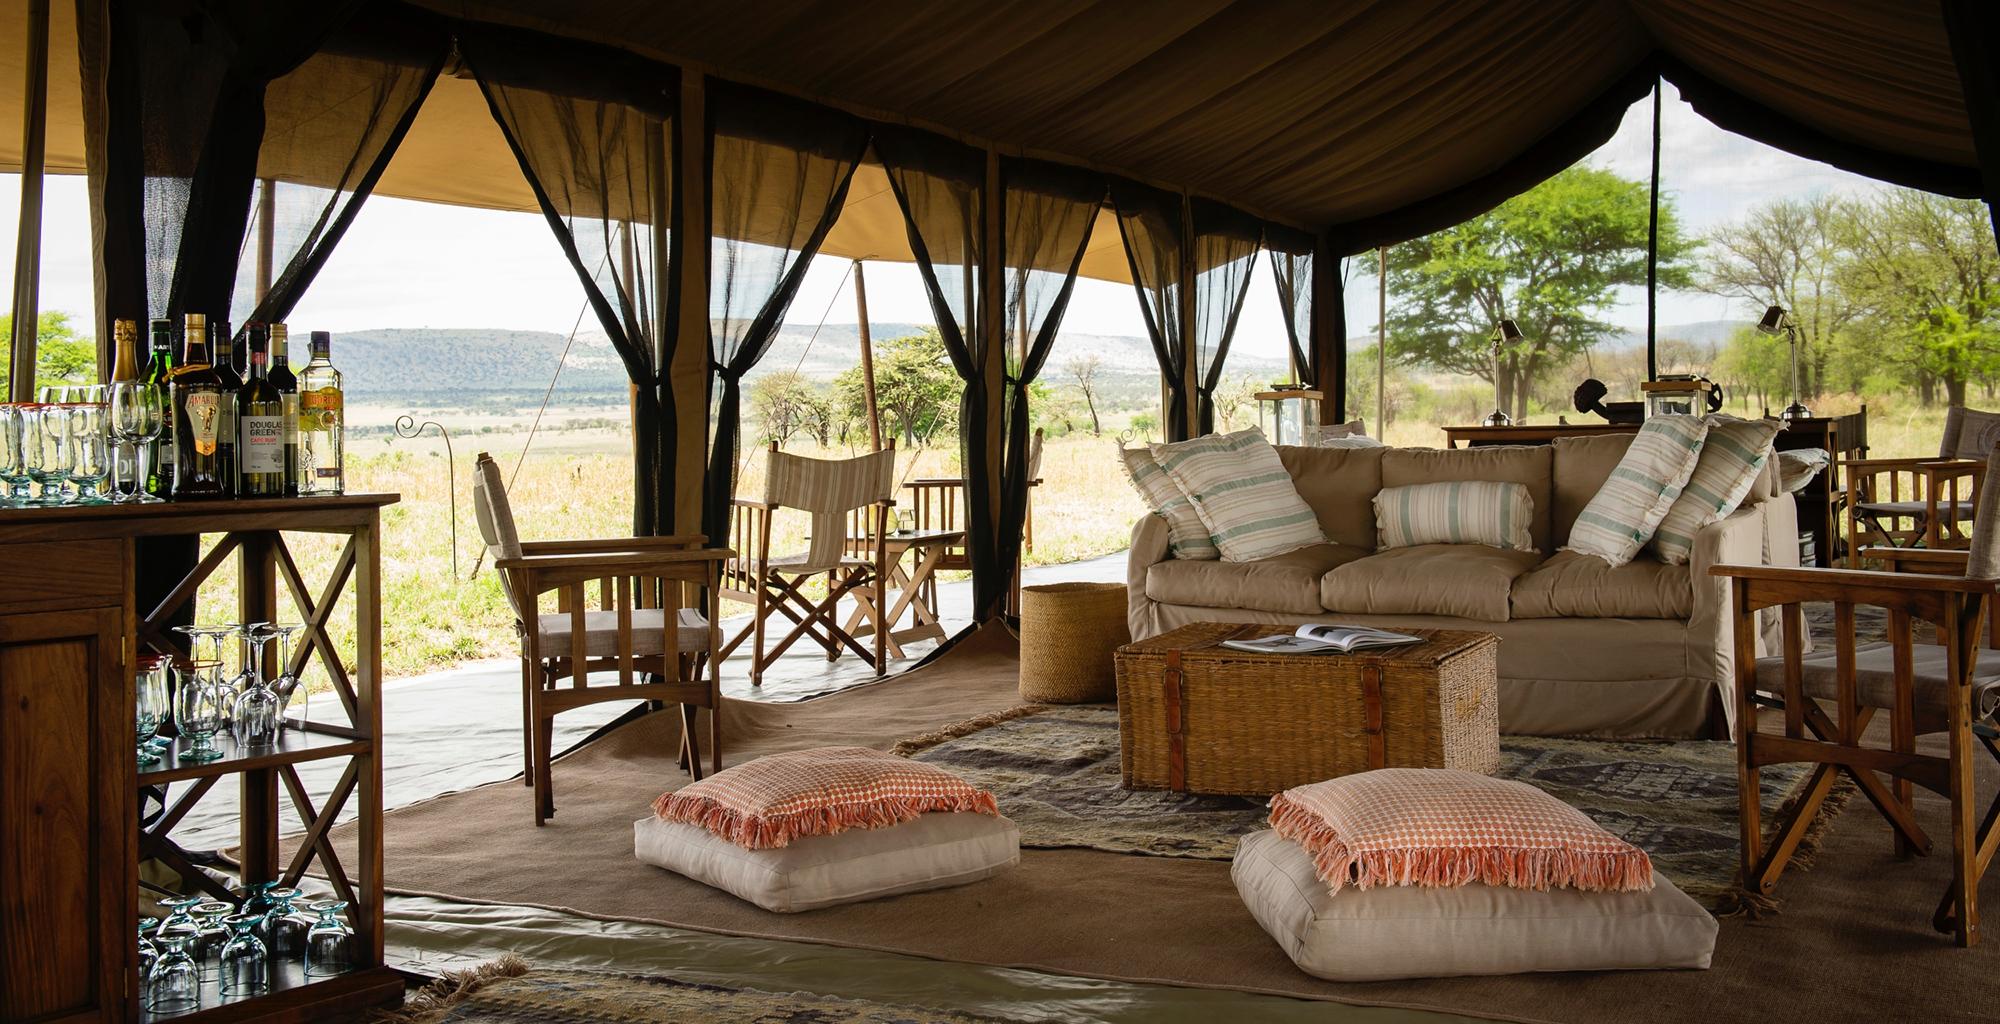 Tanzania-Serengeti-Safari-Camp-Lounge